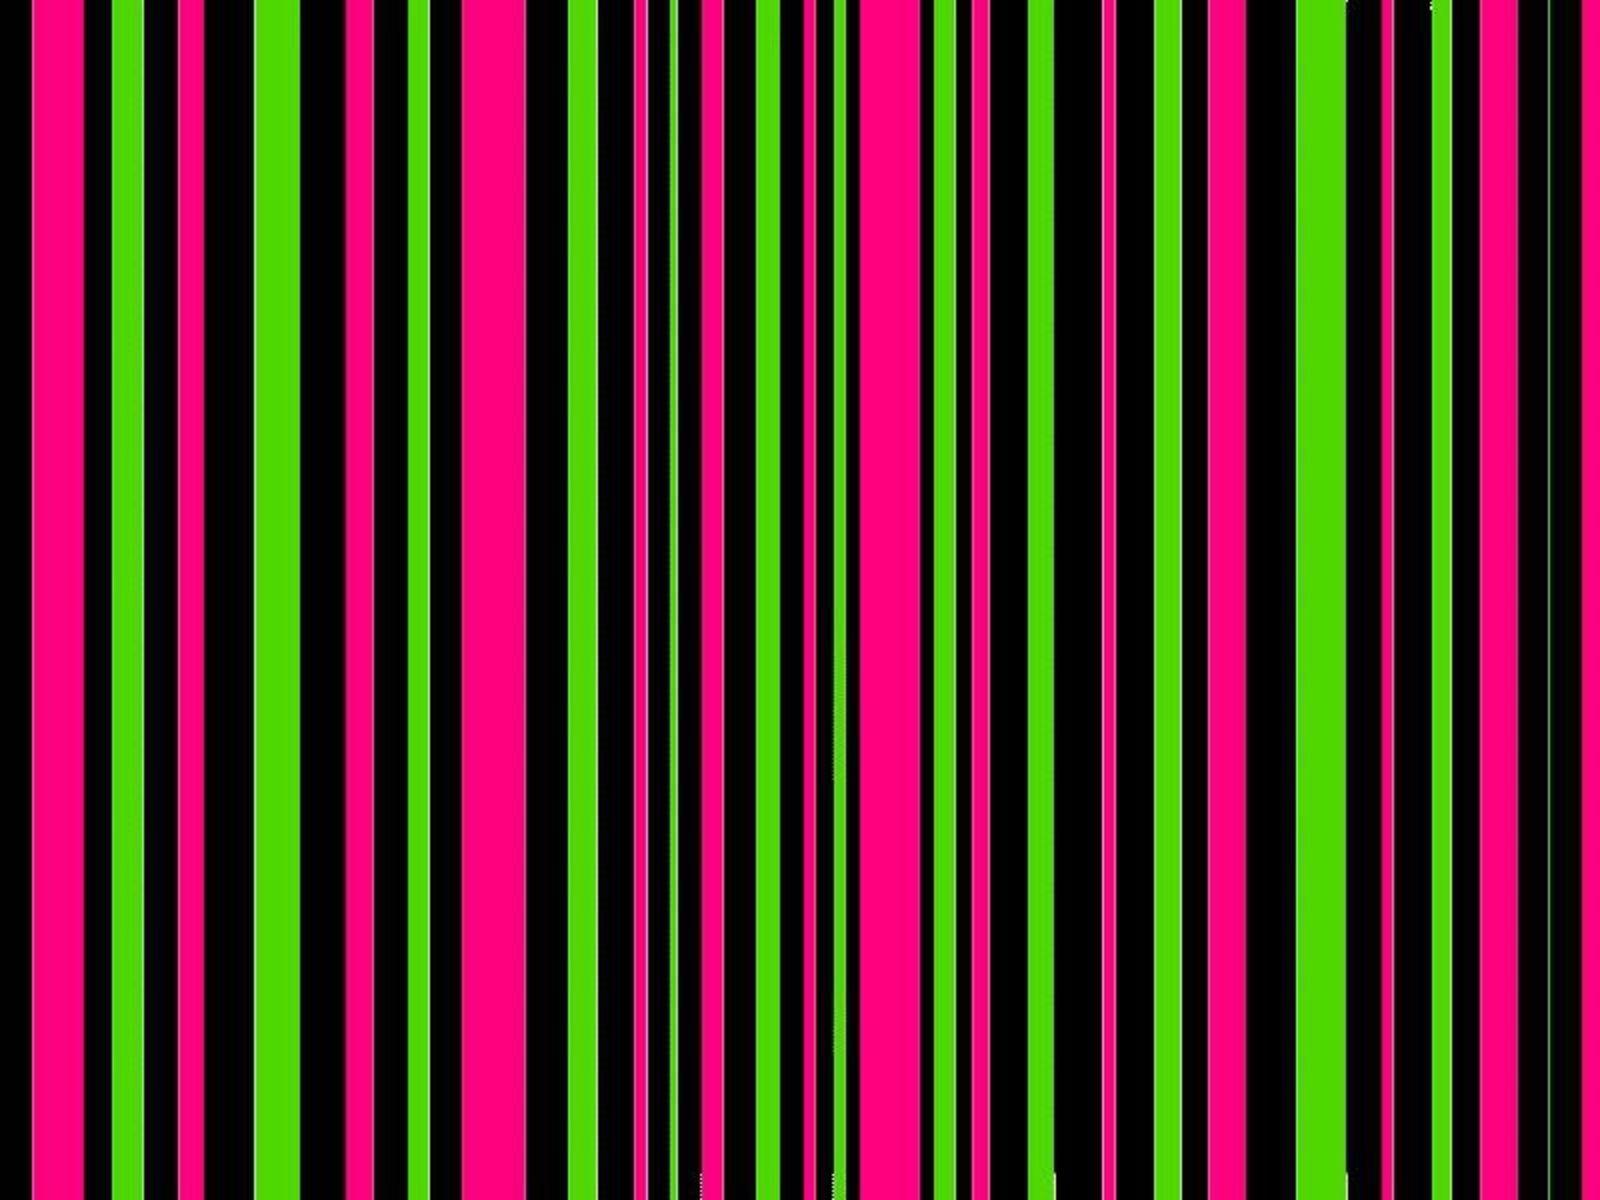 Solid Neon Colors Wallpaper